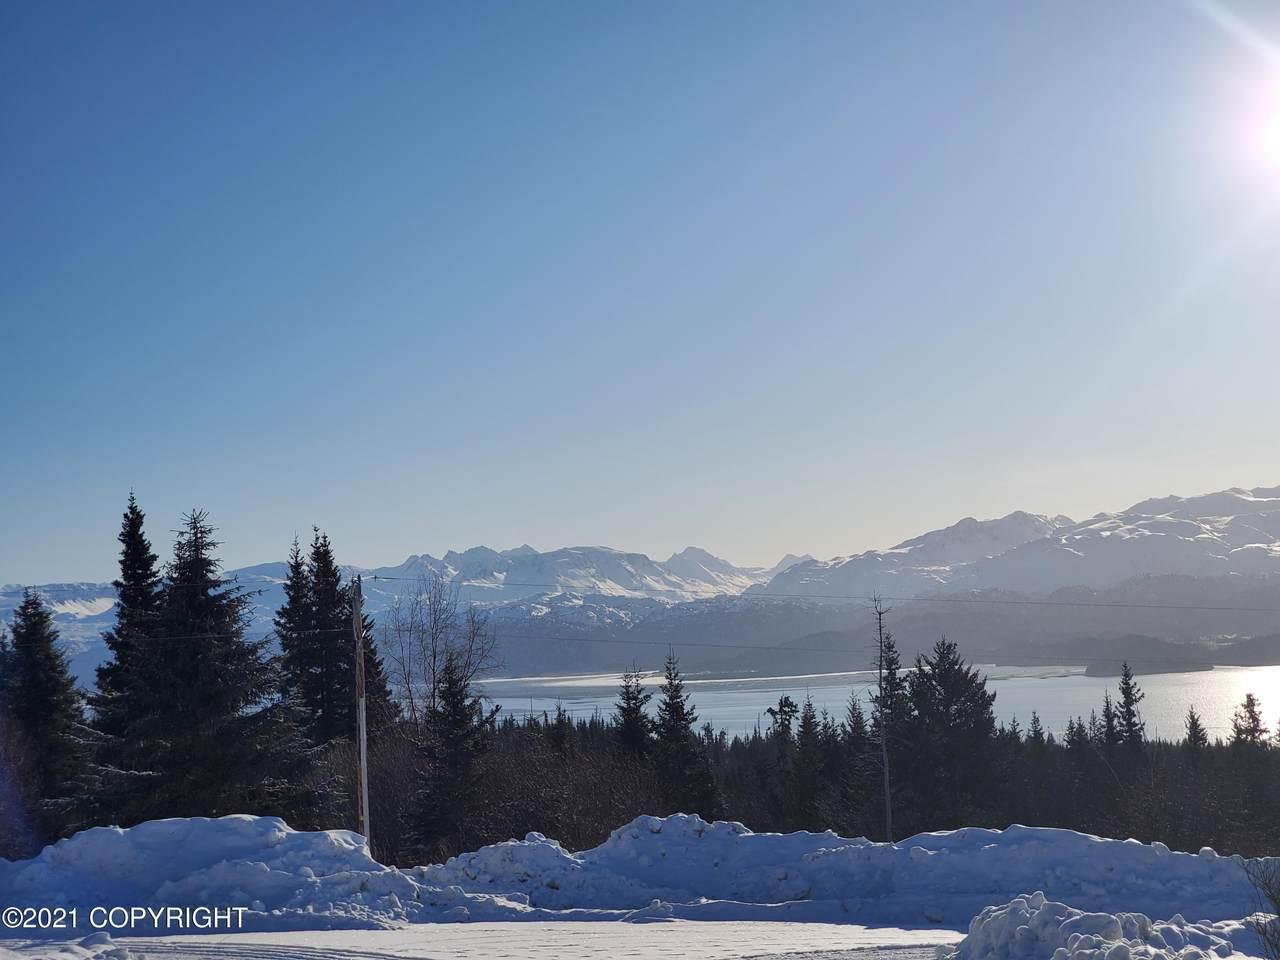 https://bt-photos.global.ssl.fastly.net/alaska/1280_boomver_1_21-3900-2.jpg